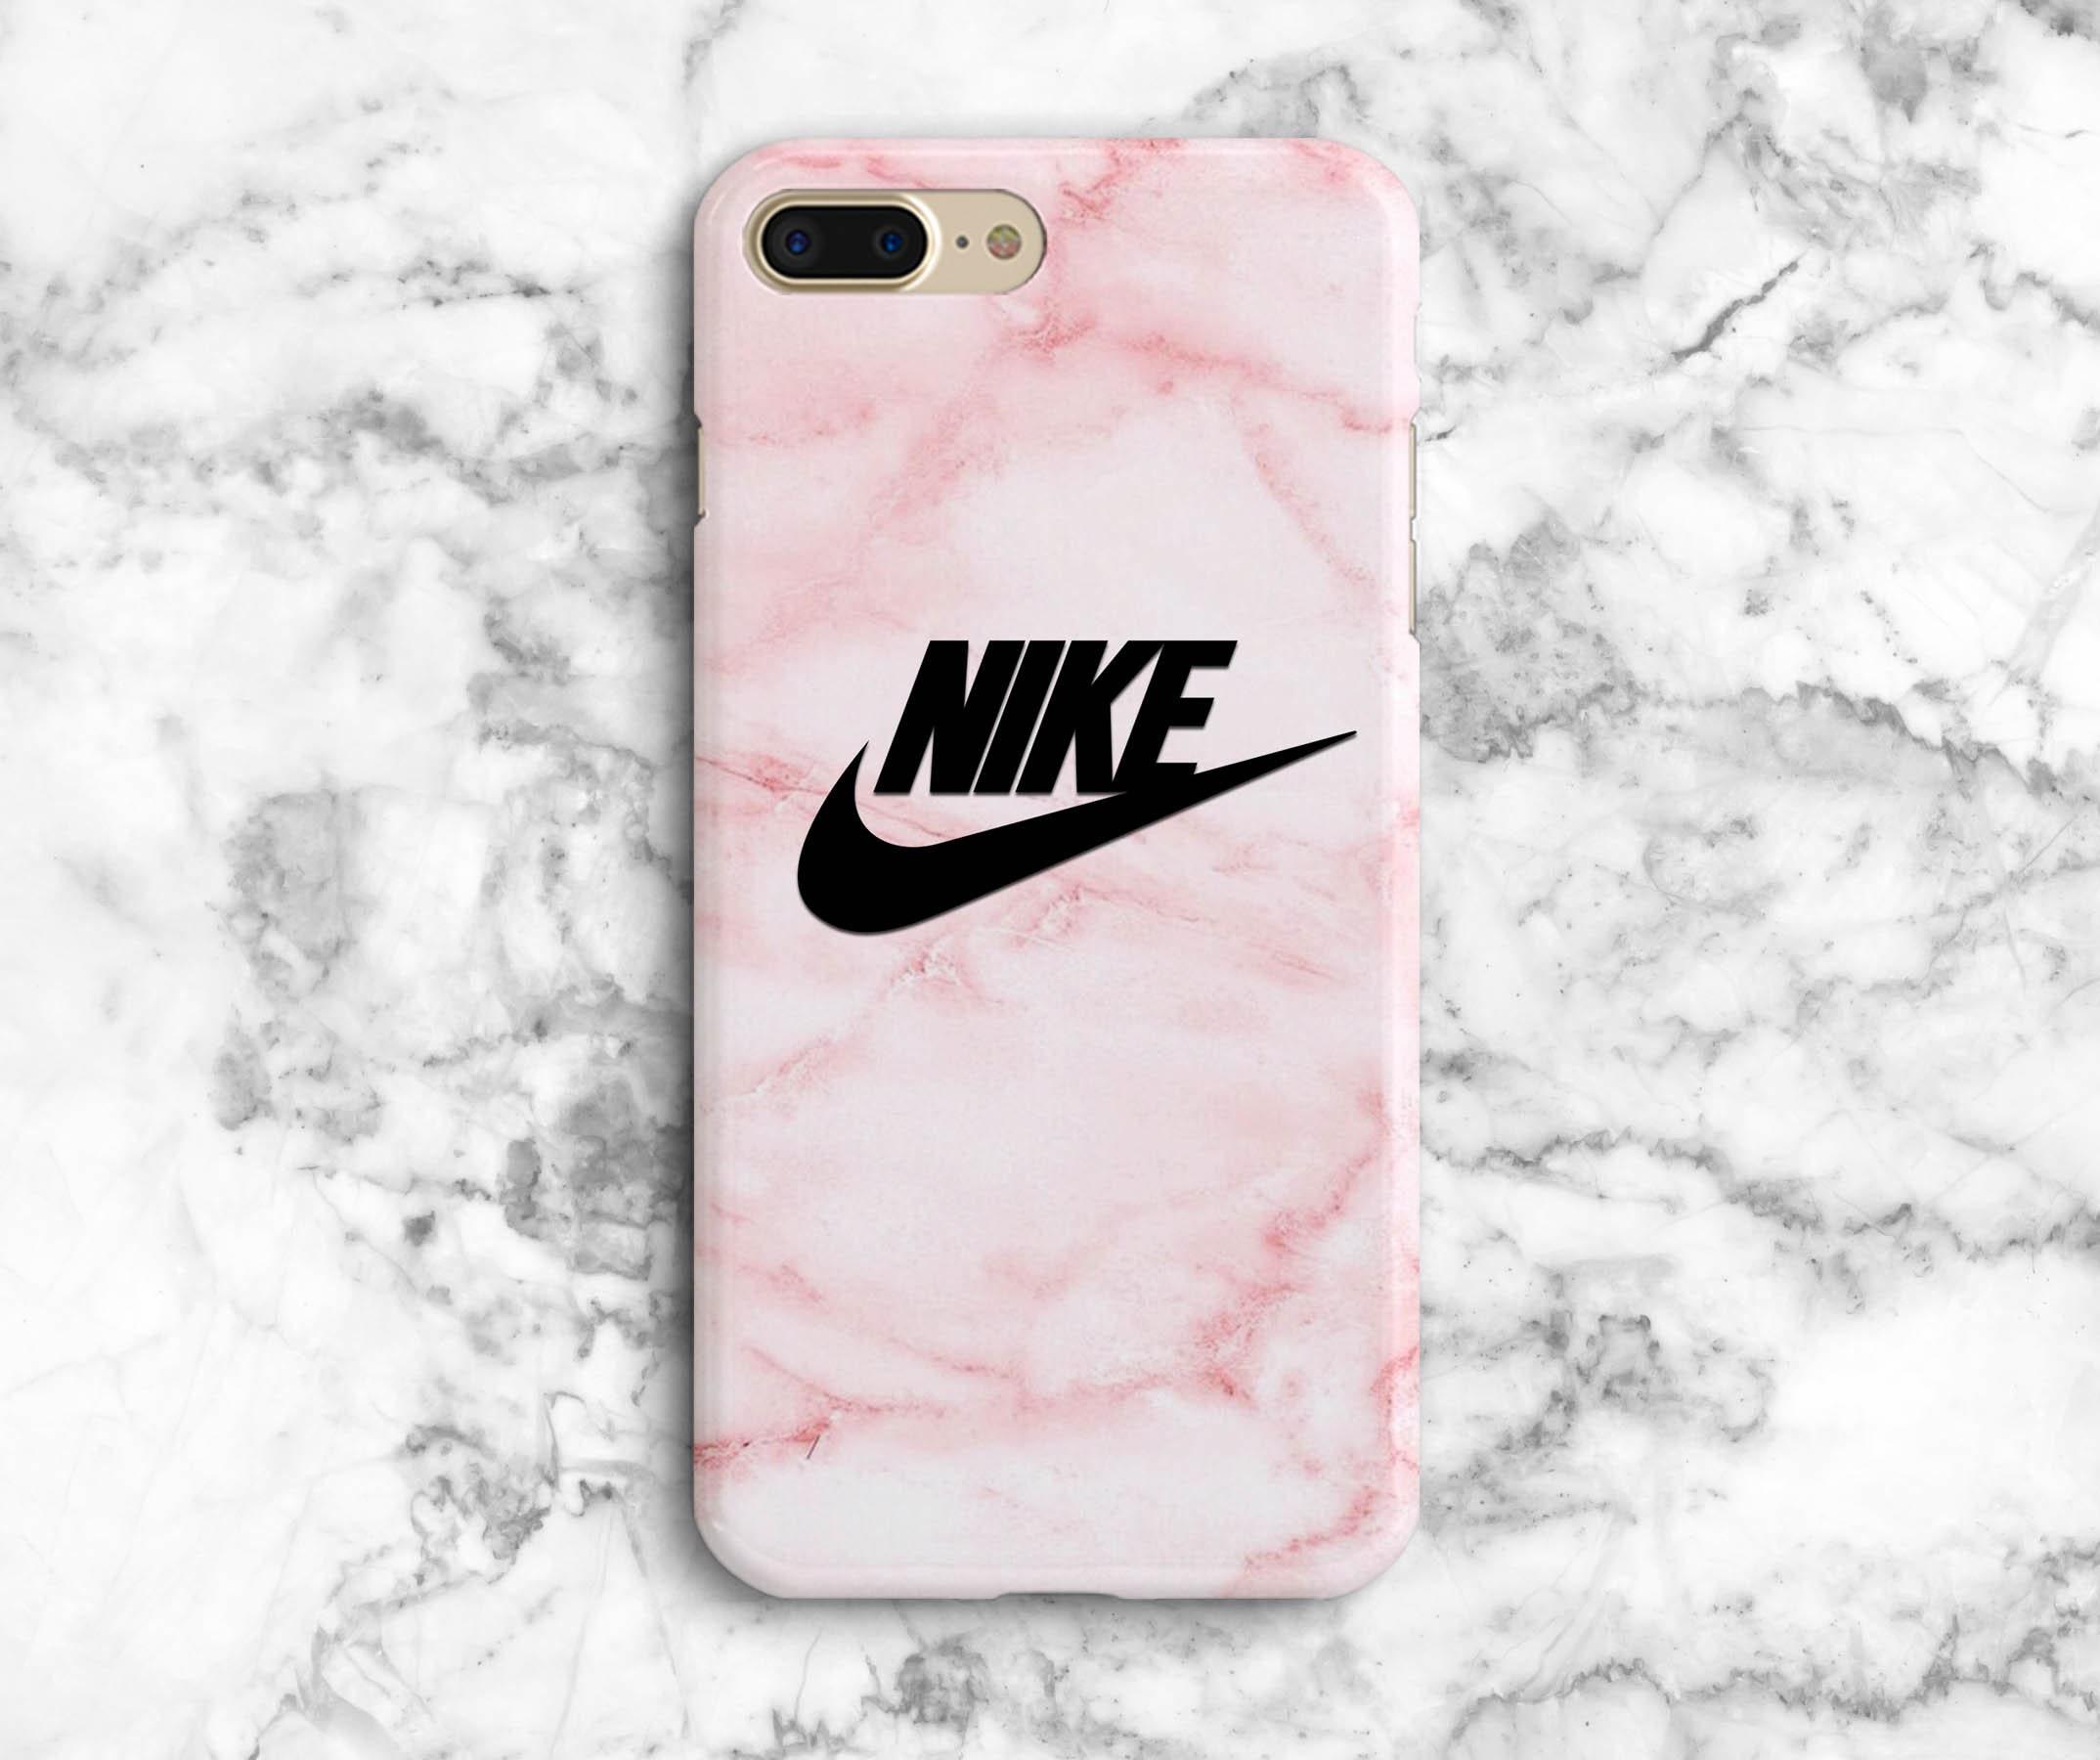 new style 6f833 ff44e Rose Nike iPhone 8 Plus case, iphone x, marble iphone 8 Plus case, Nike  iPhone 8 case, iphone 7 case, iPhone 6 Plus case inspired by Nike